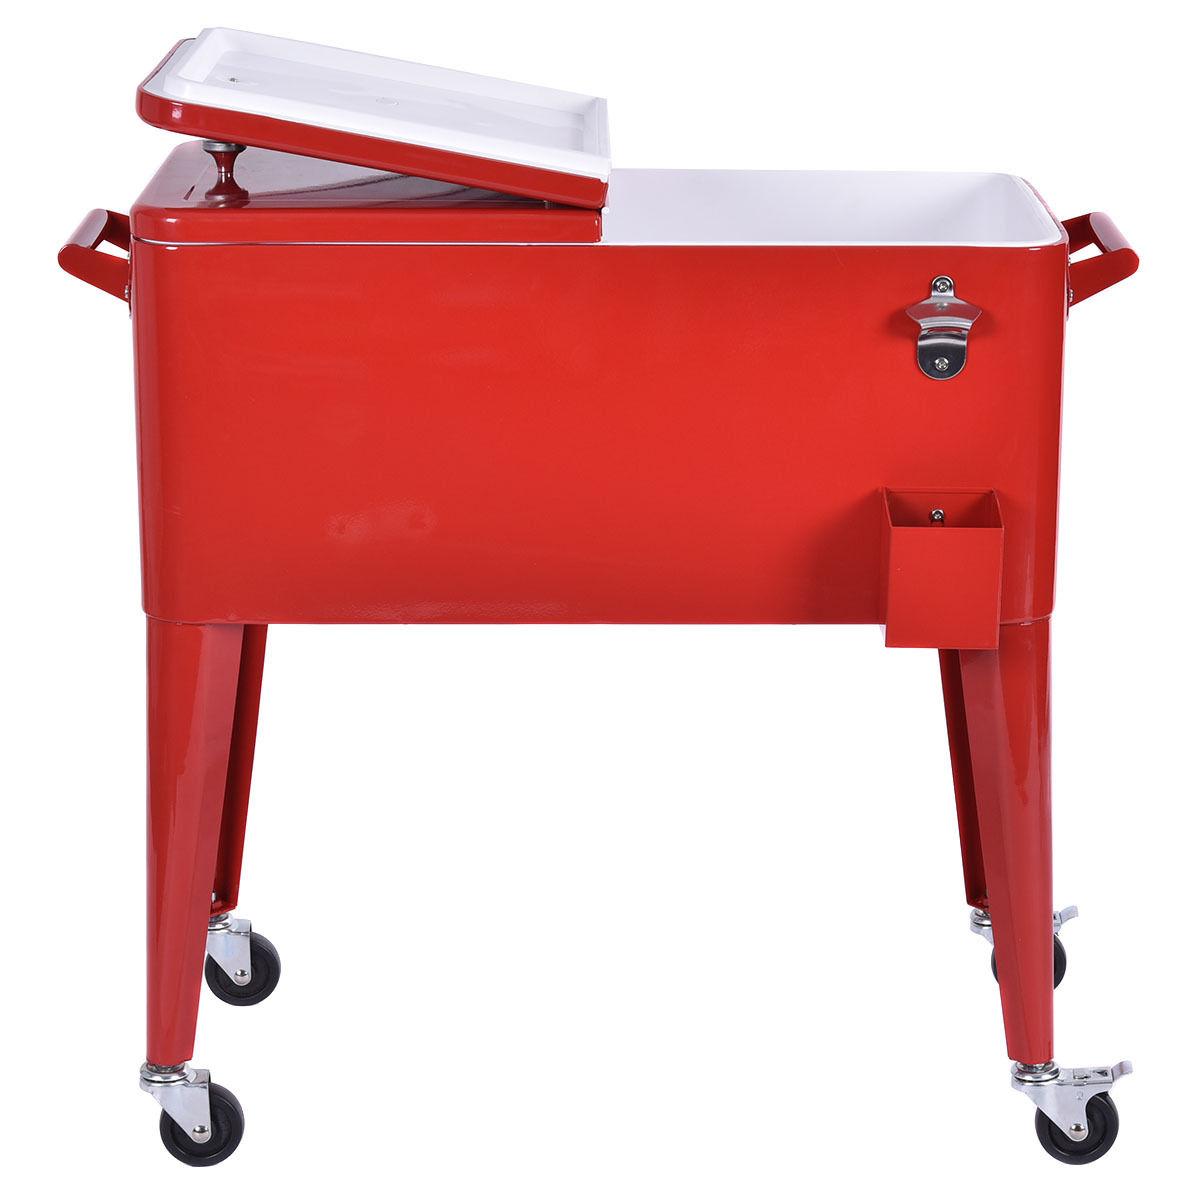 Red Portable Outdoor Patio Cooler Cart